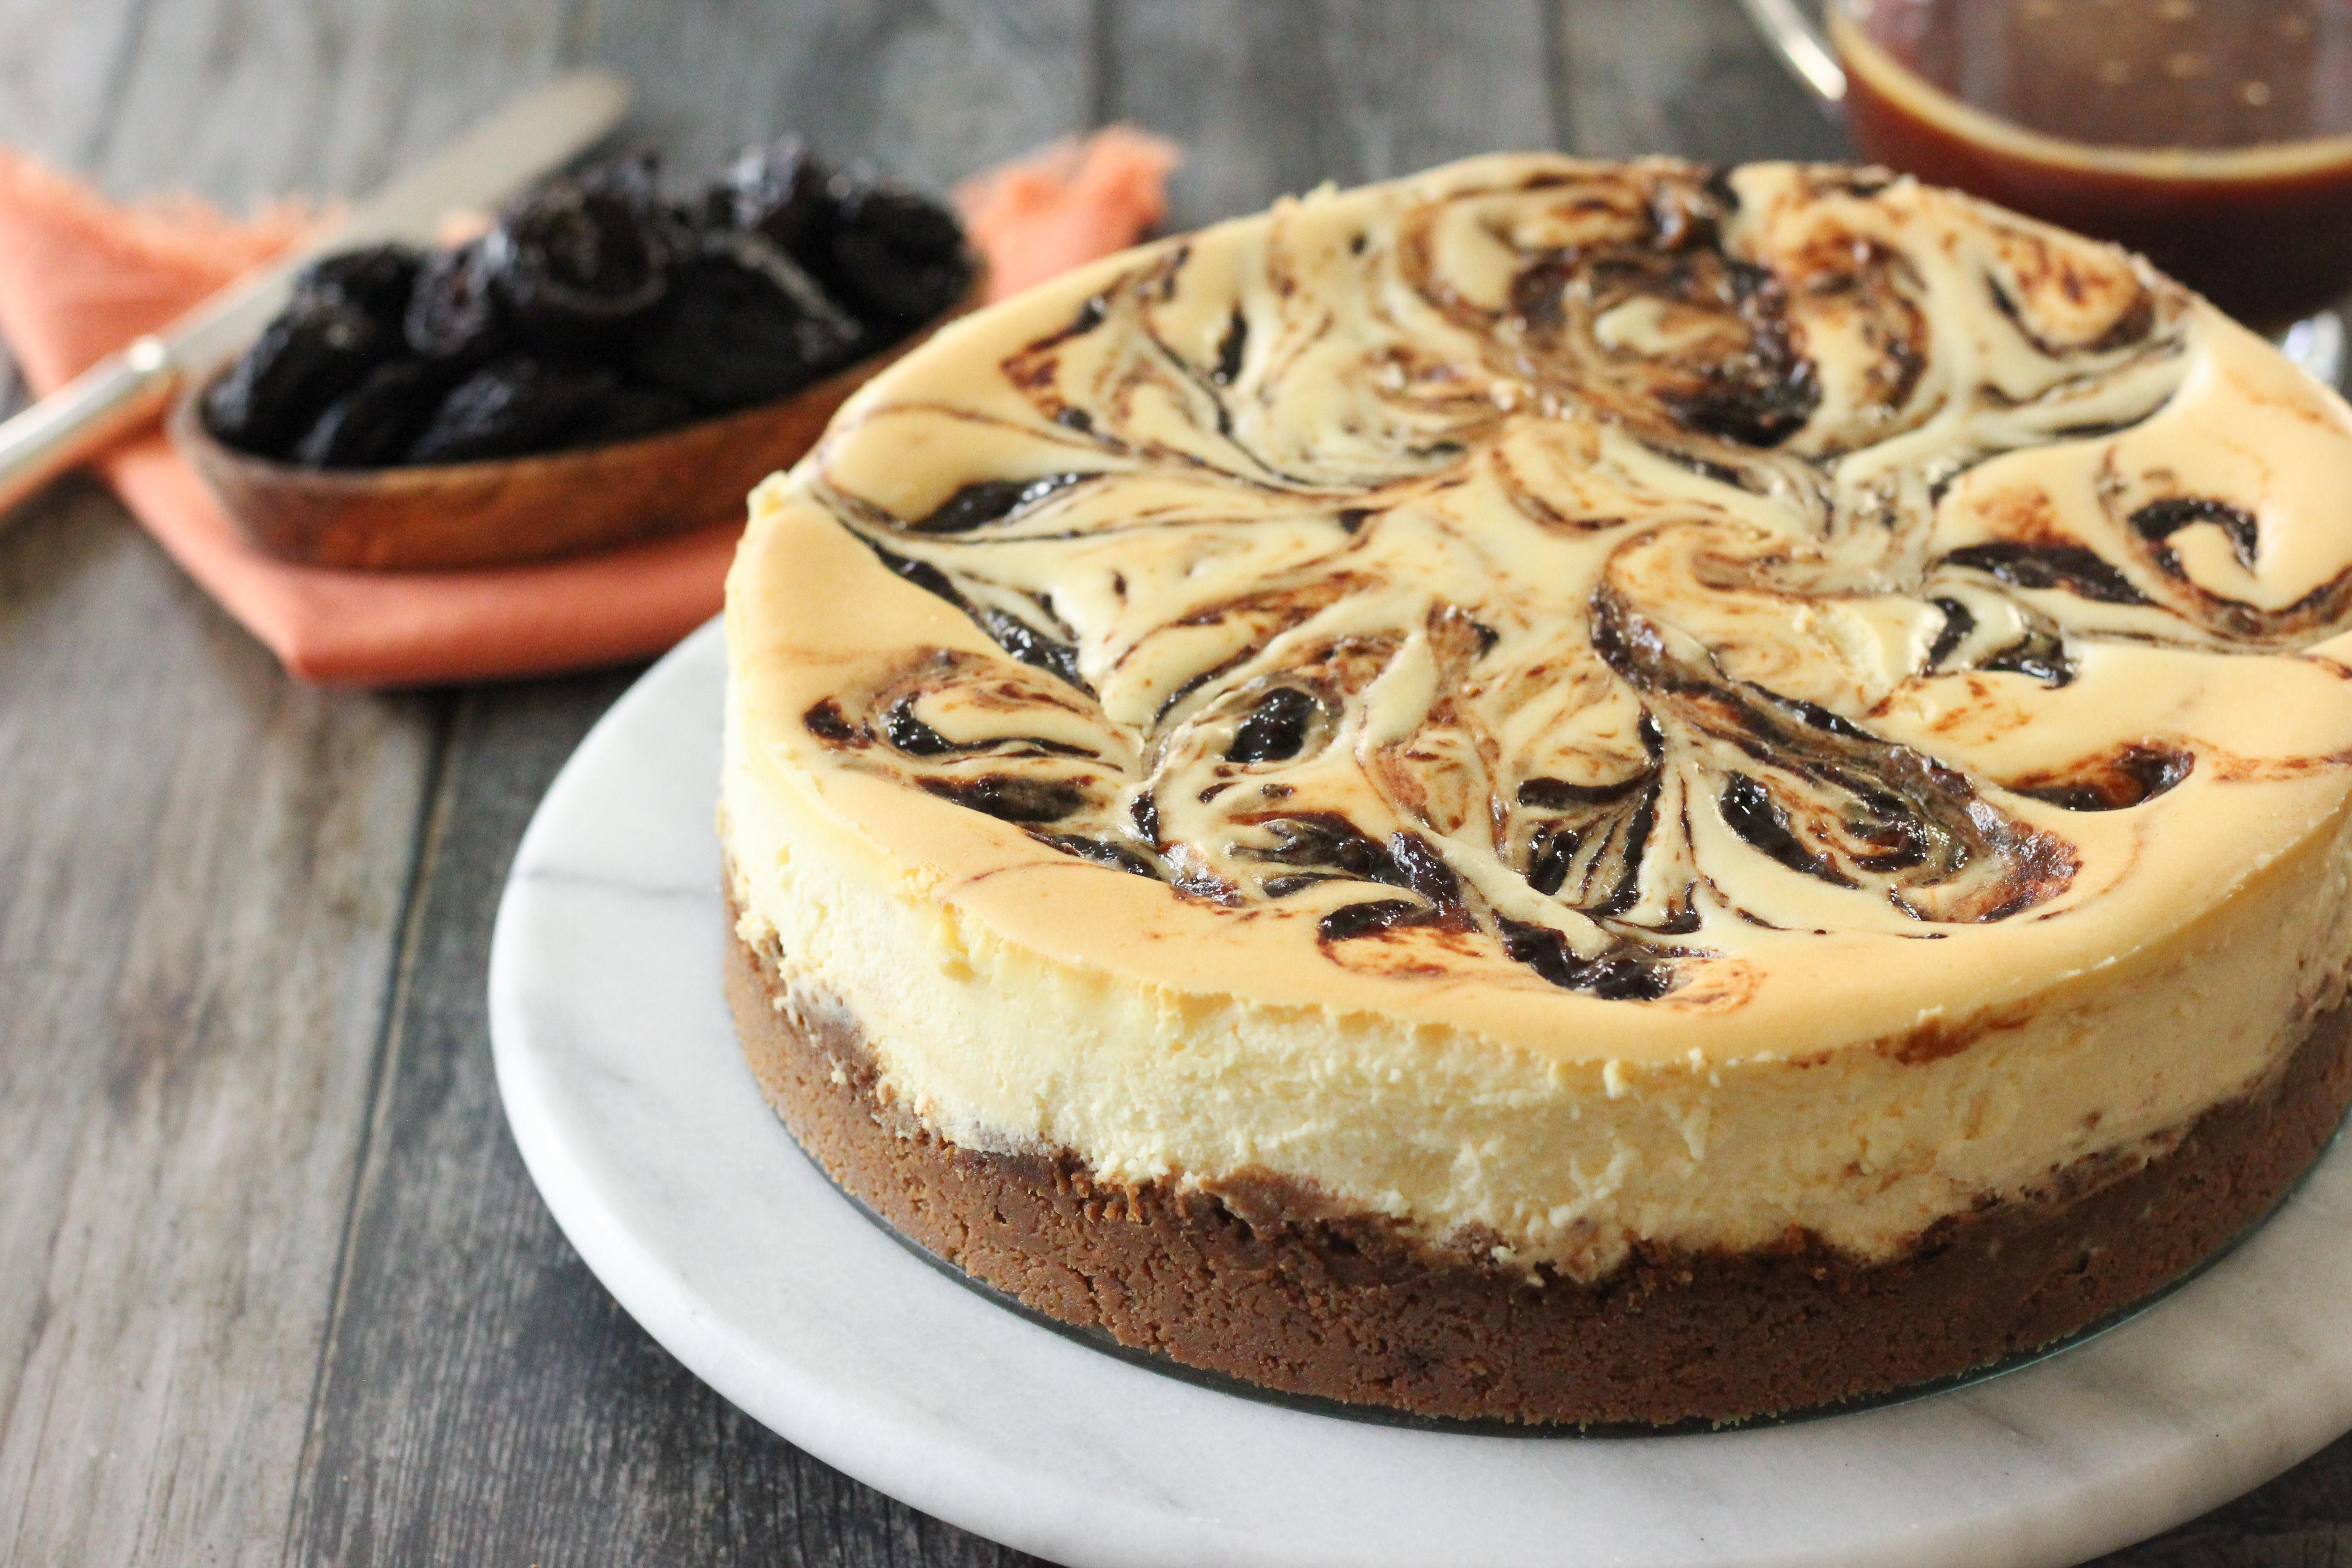 Prune Cheesecake Salted Caramel Sauce